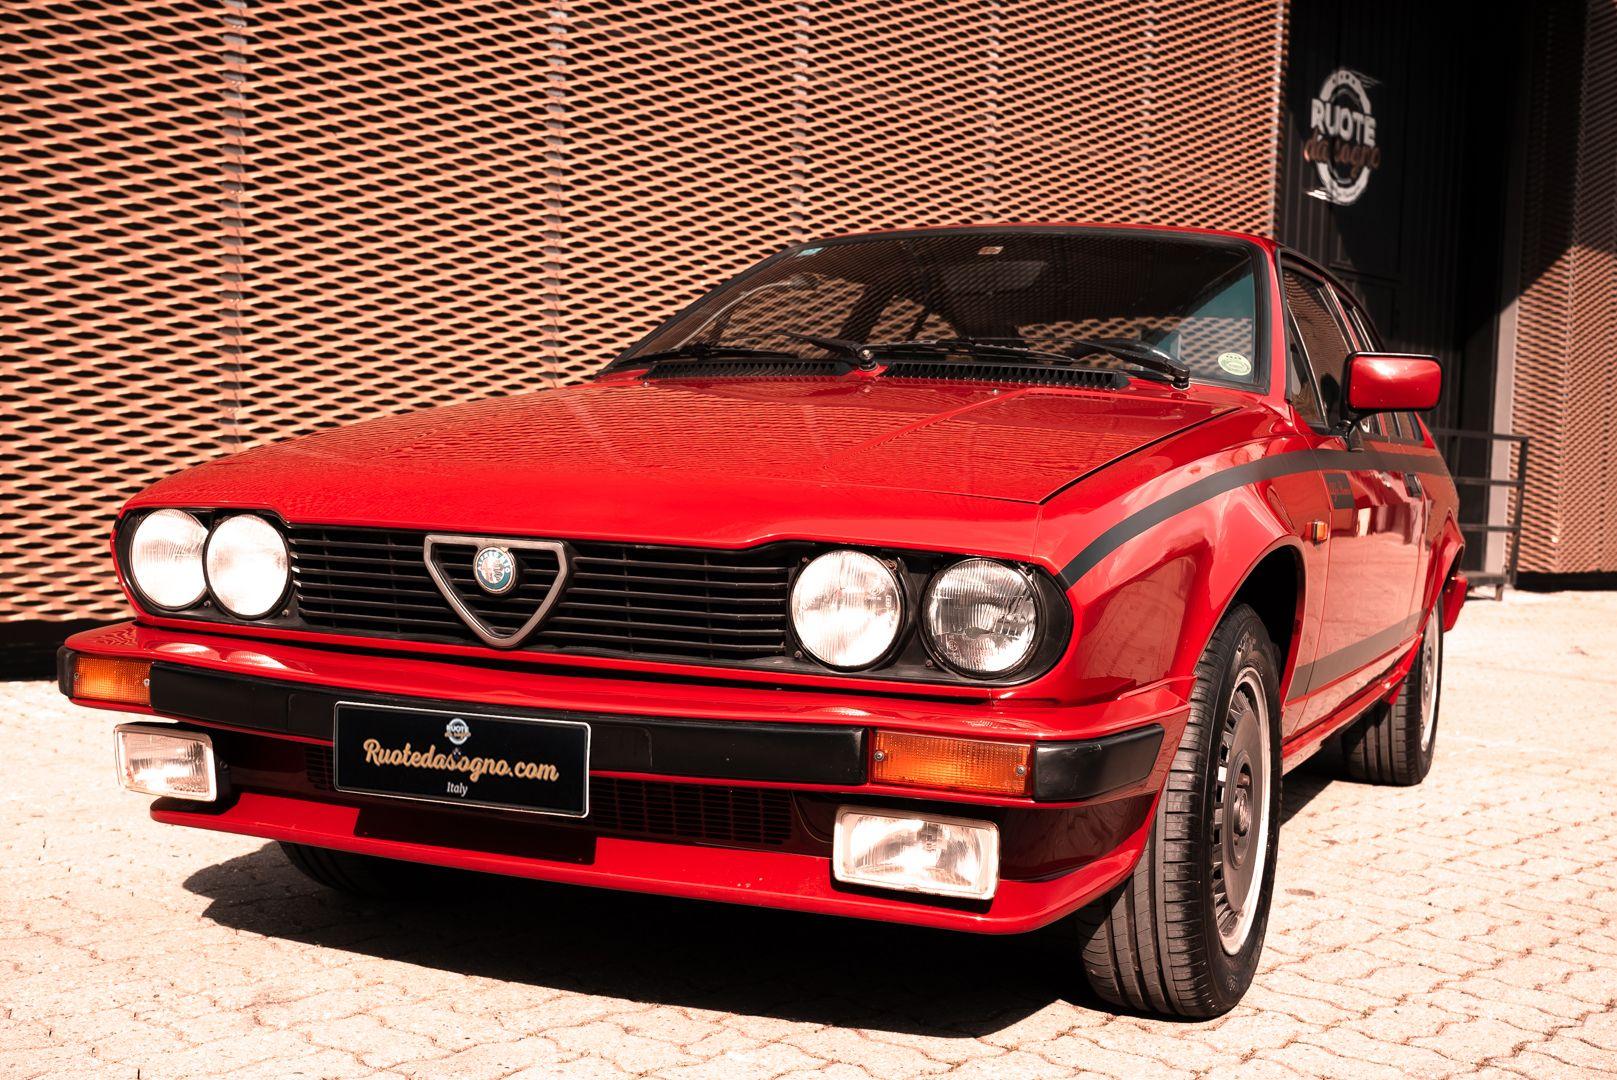 1981 Alfa Romeo Alfetta GTV Gran Prix n.128 68557